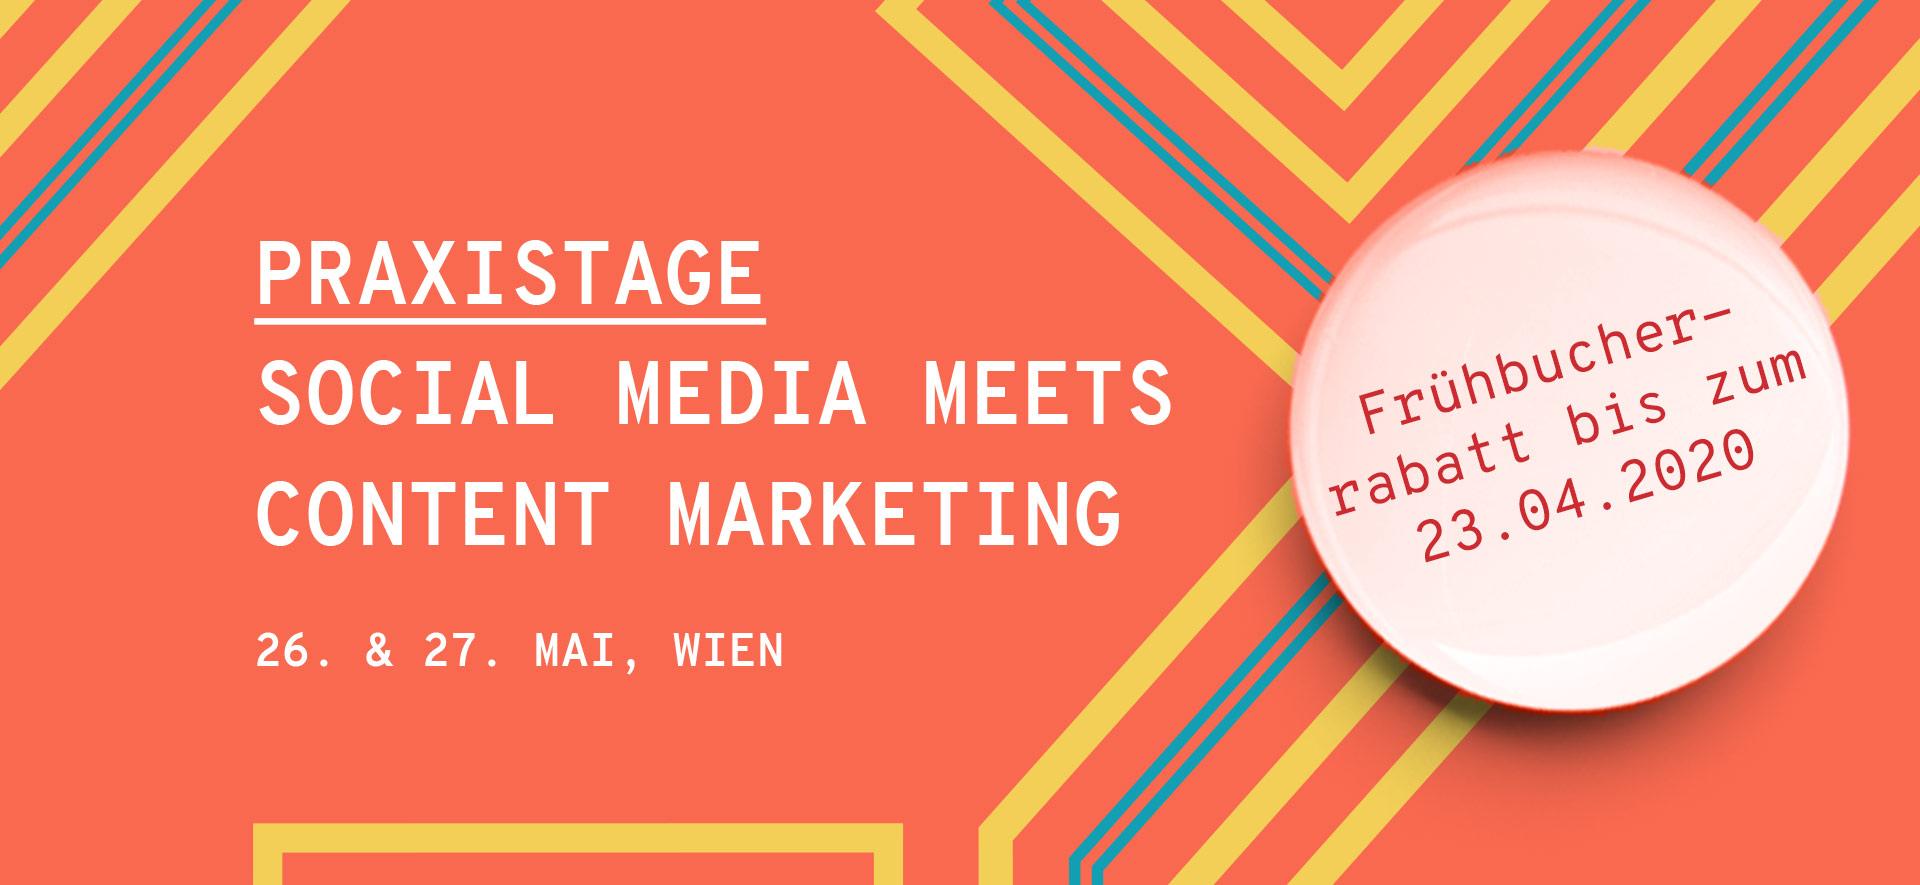 Praxistage Social Media meets Content Marketing